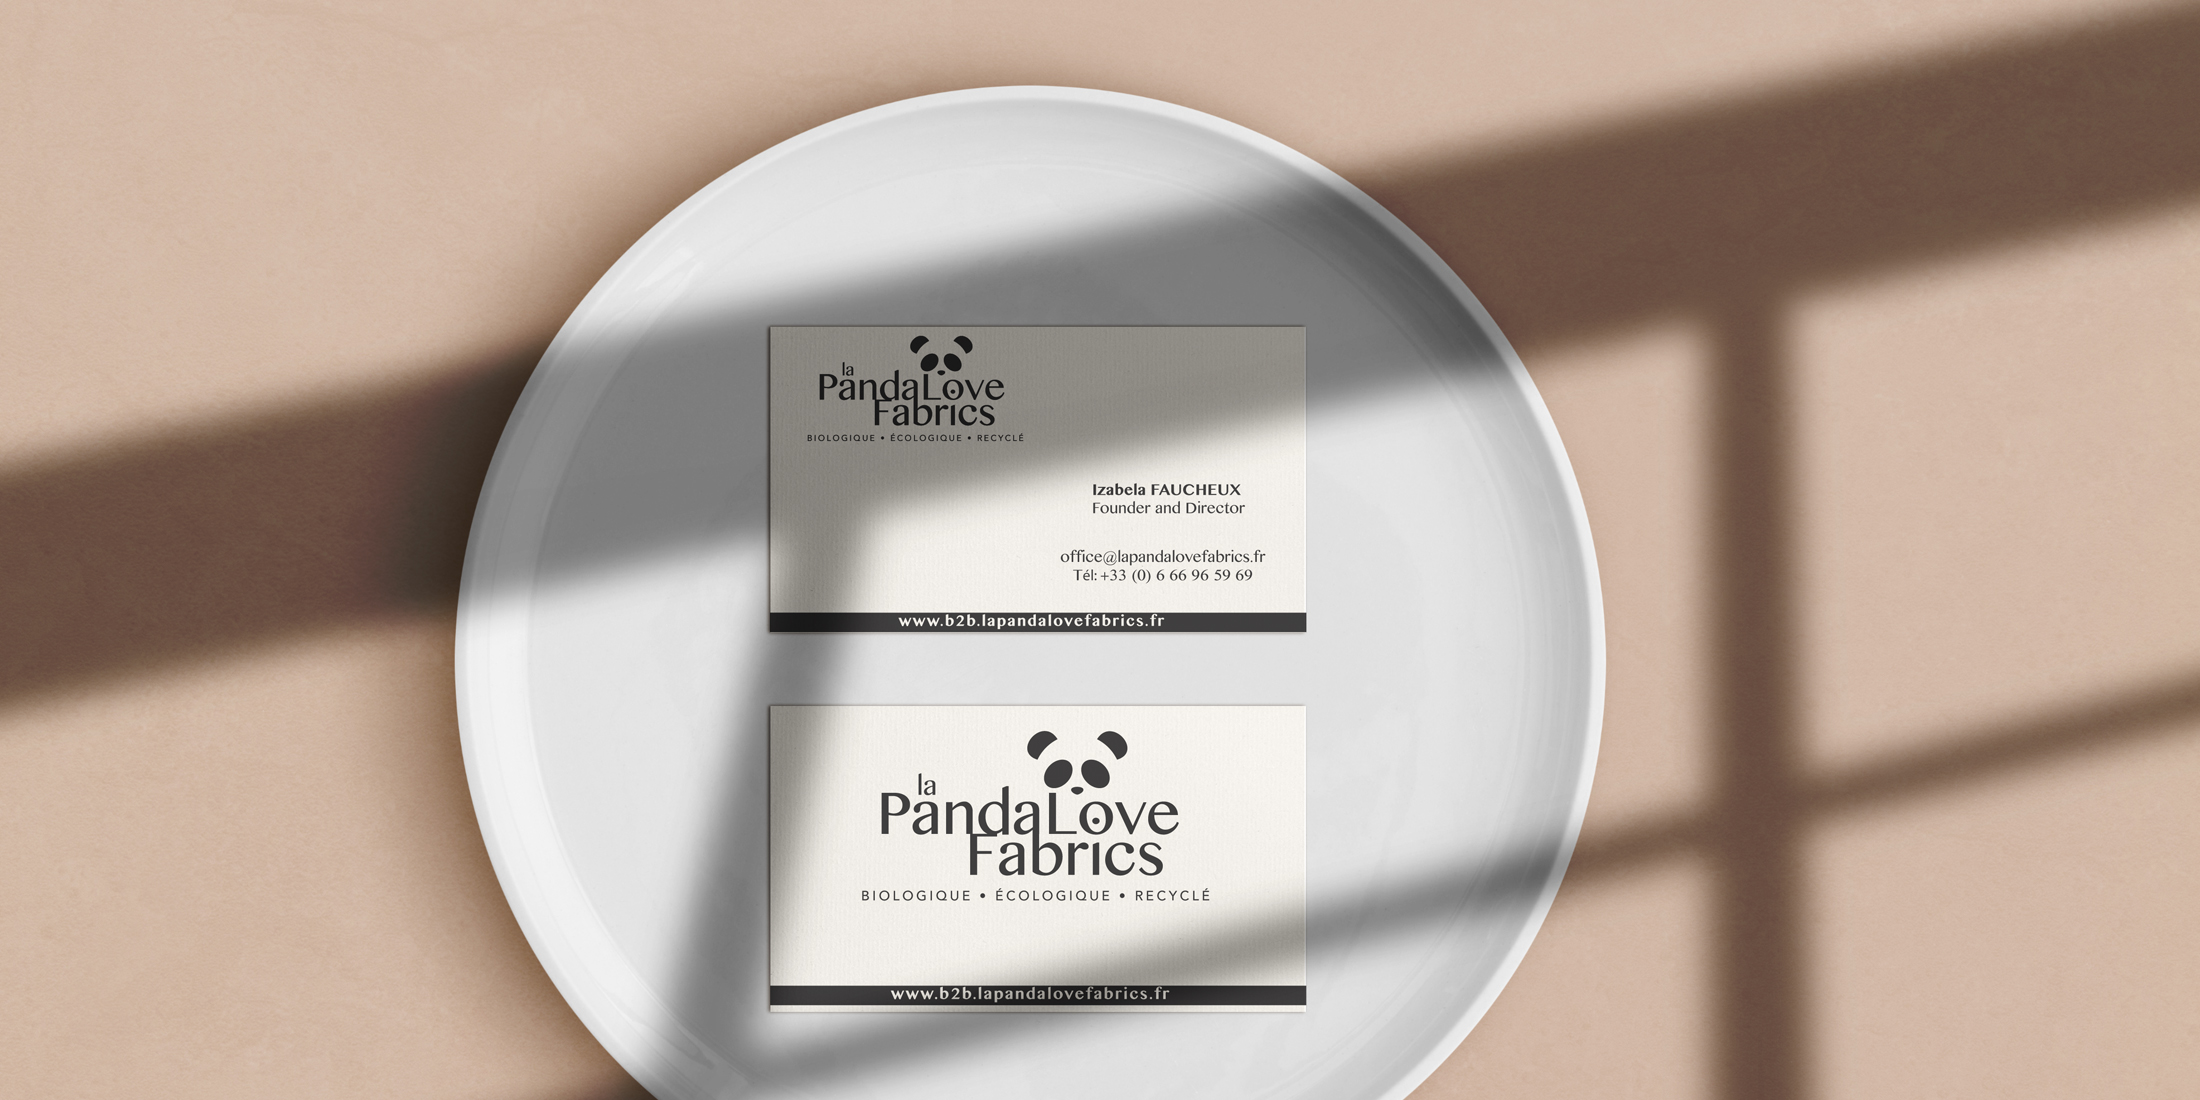 Branding marque panda love fabrics Chic Studio